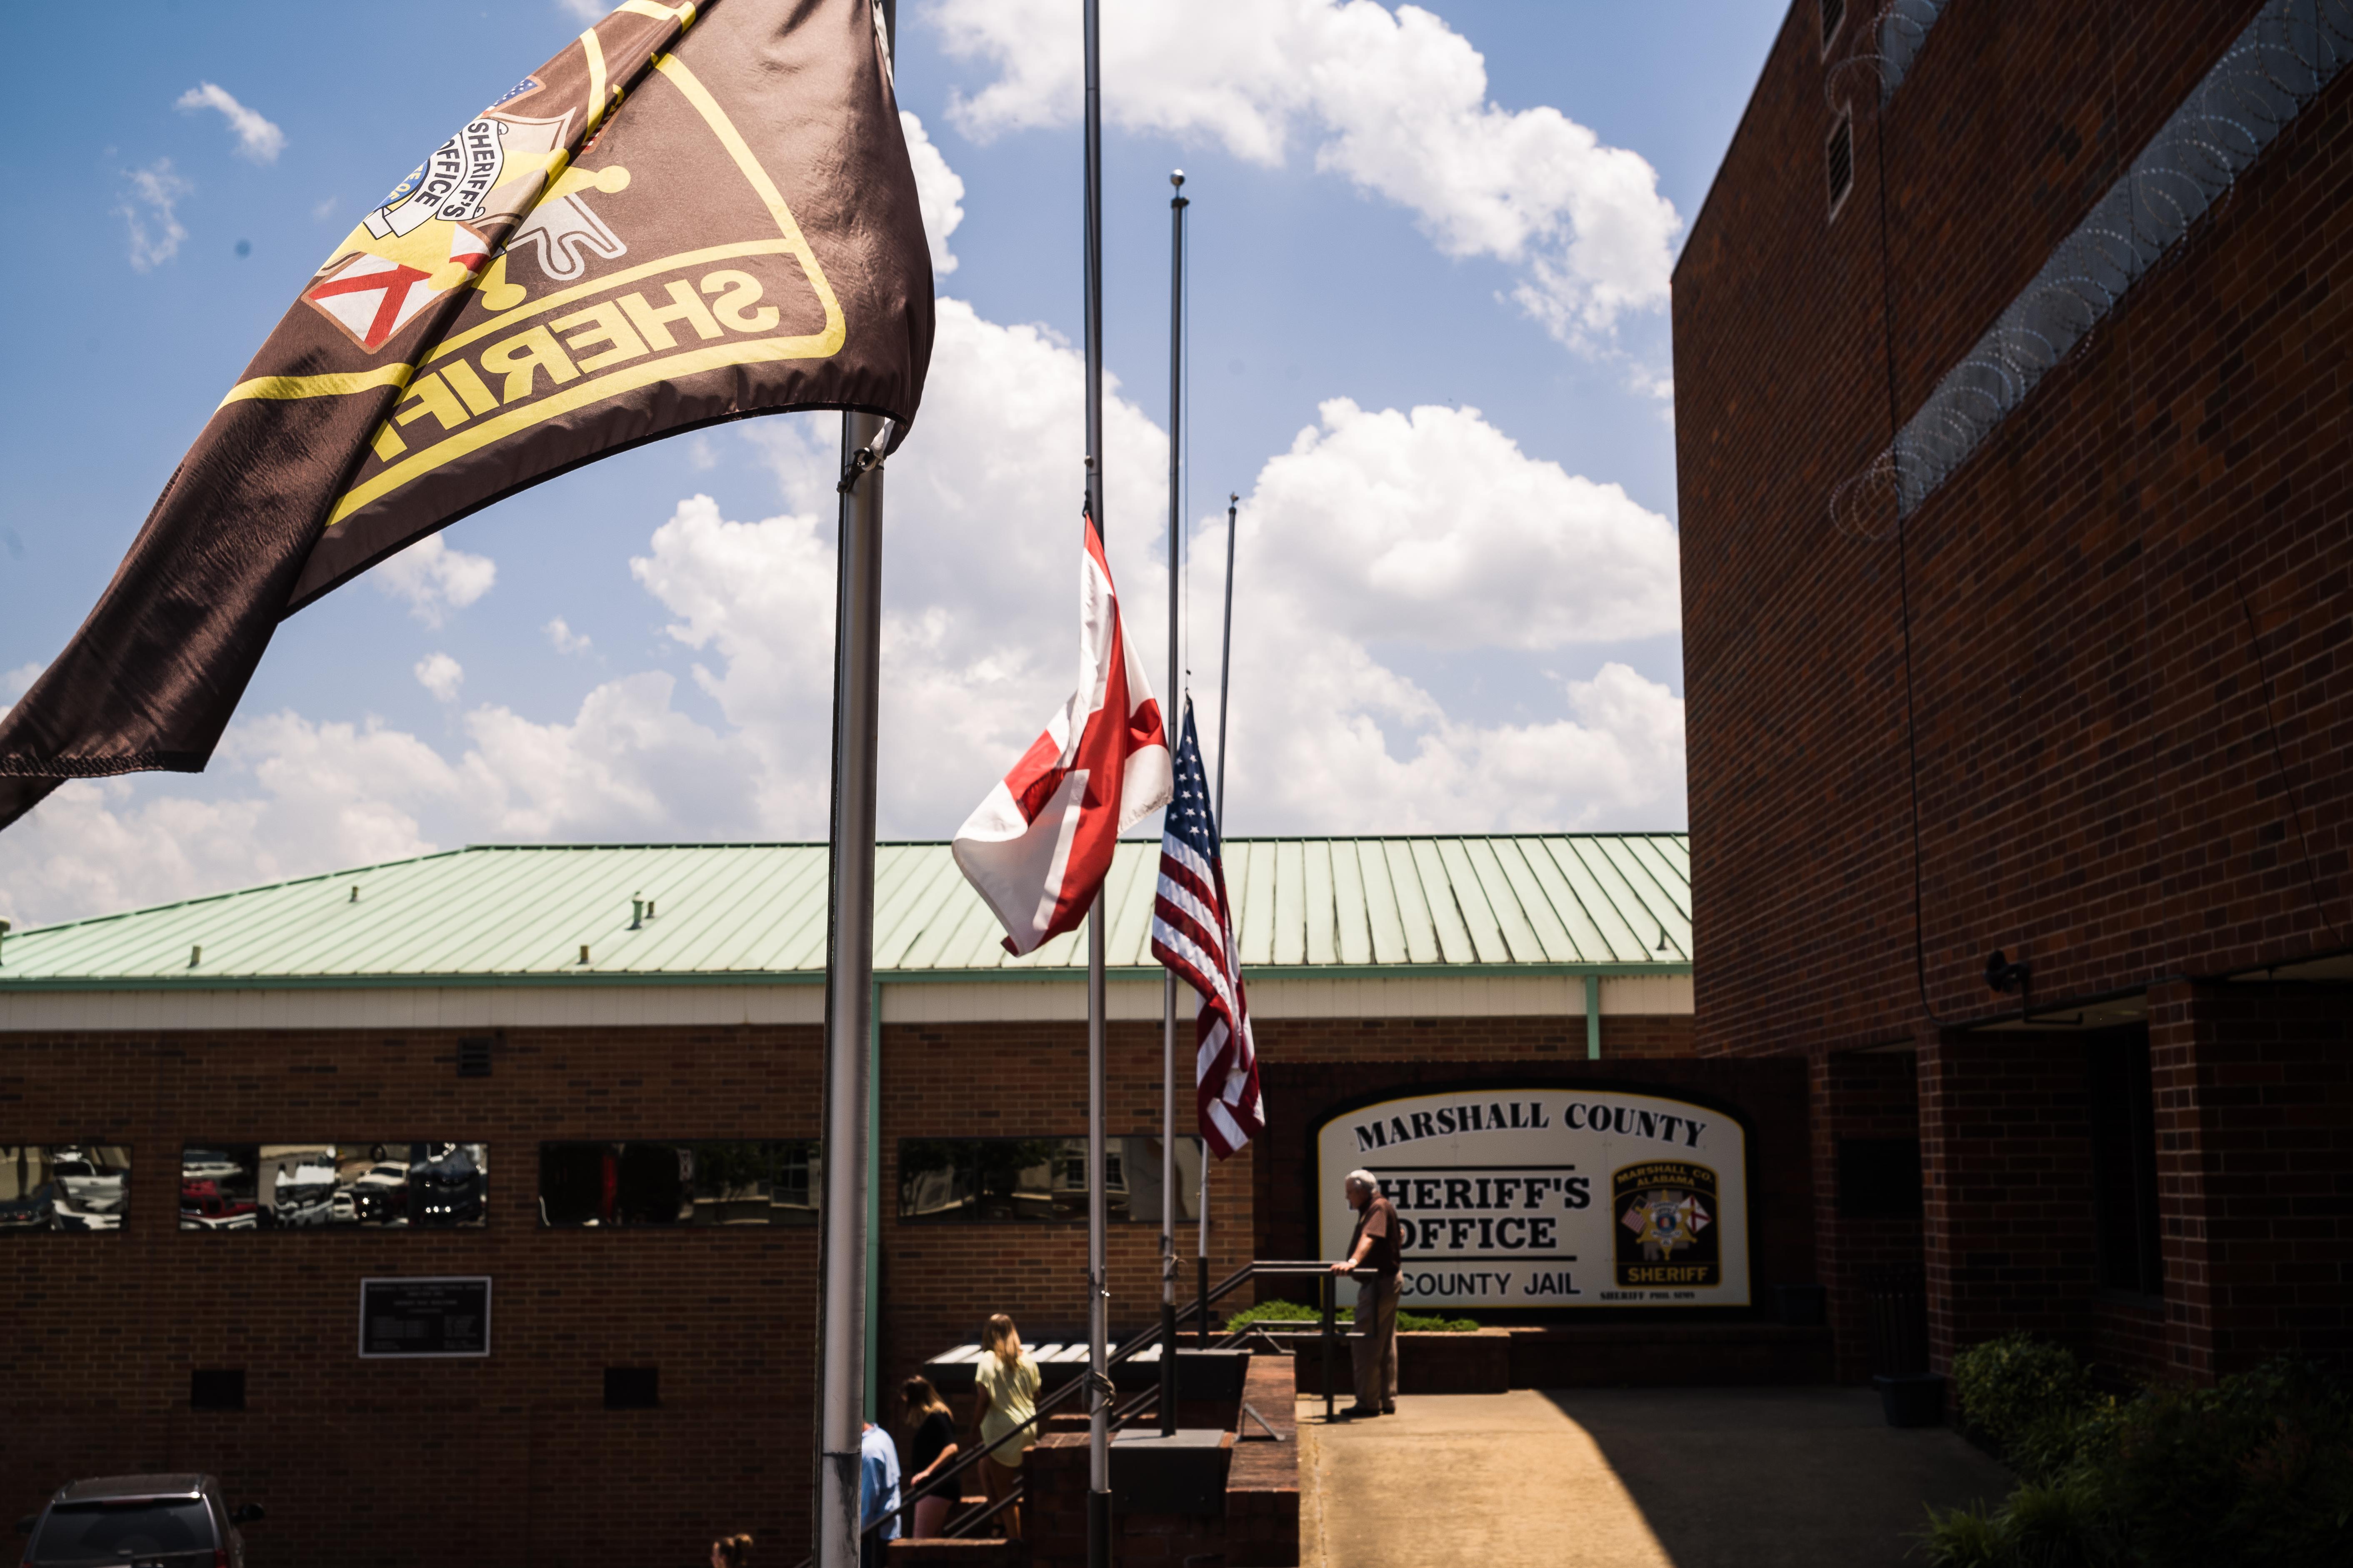 Wasted funds, destroyed property: How Alabama sheriffs